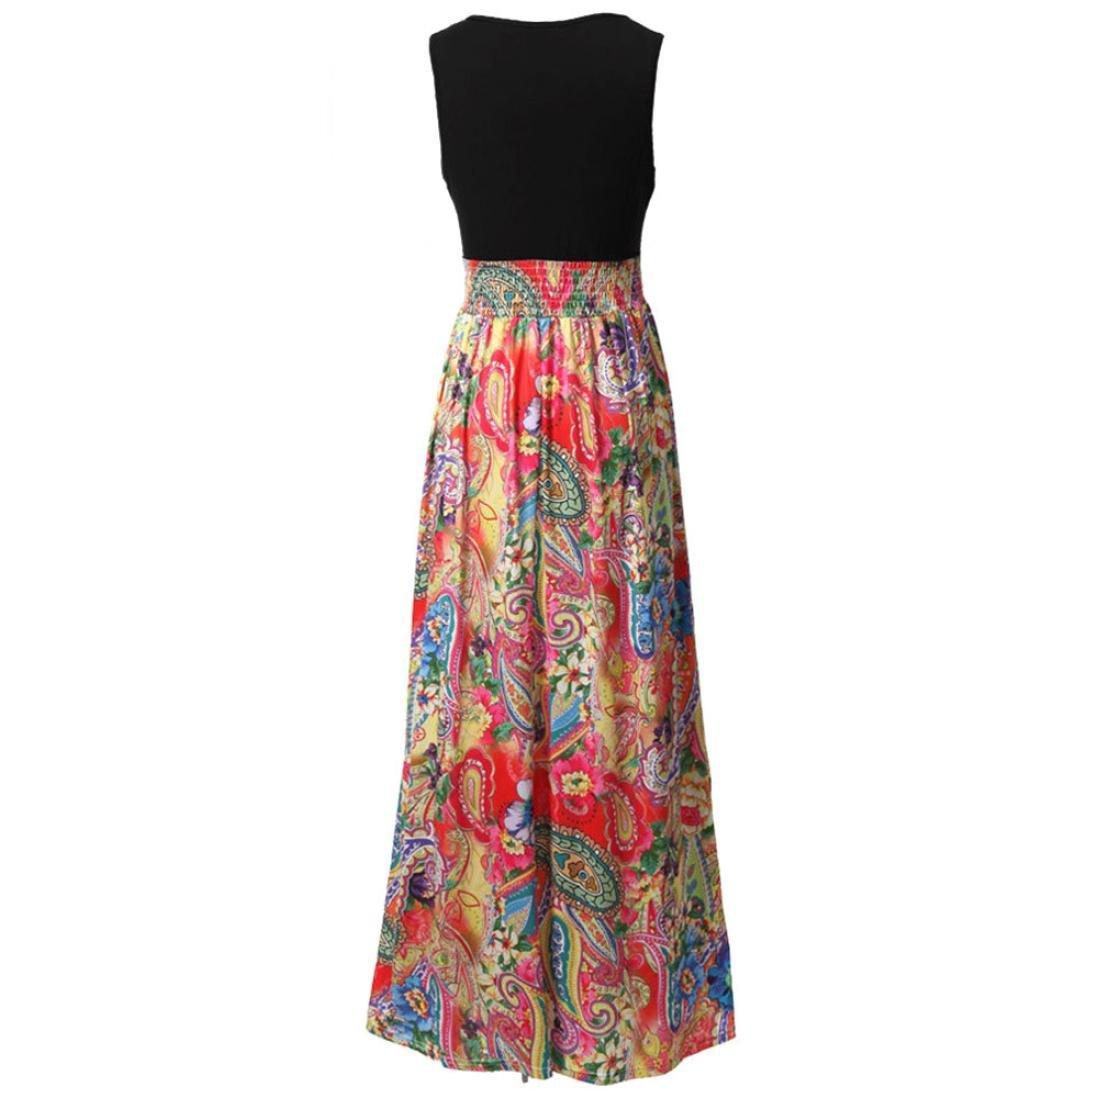 Amazon.com: kaifongfu Summer Women Dress V-neck Boho Maxi Beach Long Cocktail Party Floral Dress Tank Top Dress: Sports & Outdoors